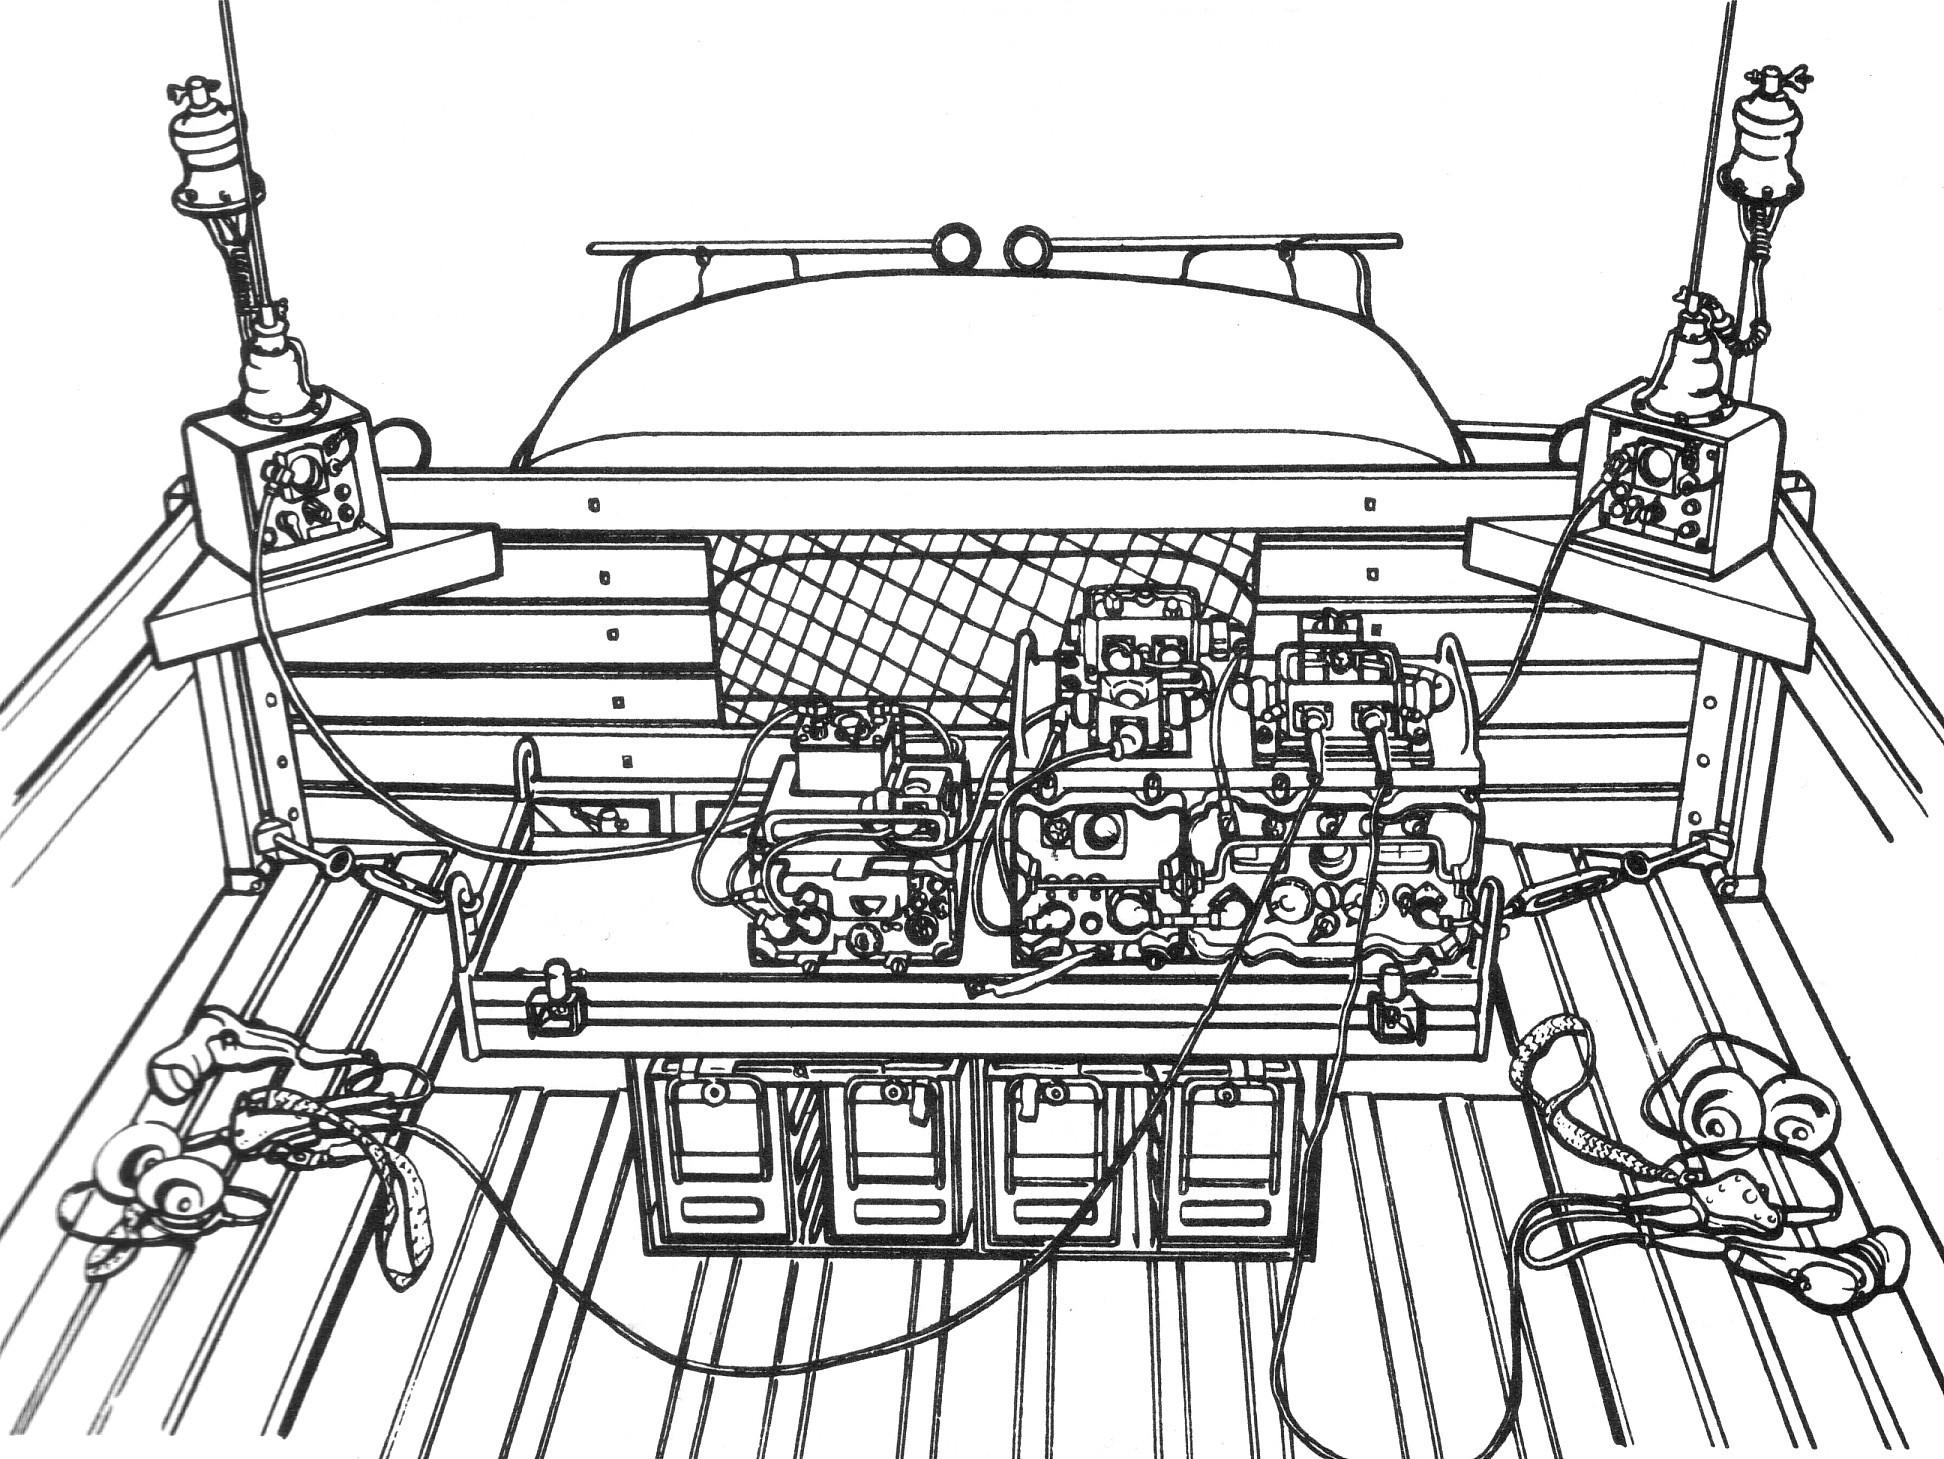 Australian Army Radio Gear For B Class Vehicles Remlr